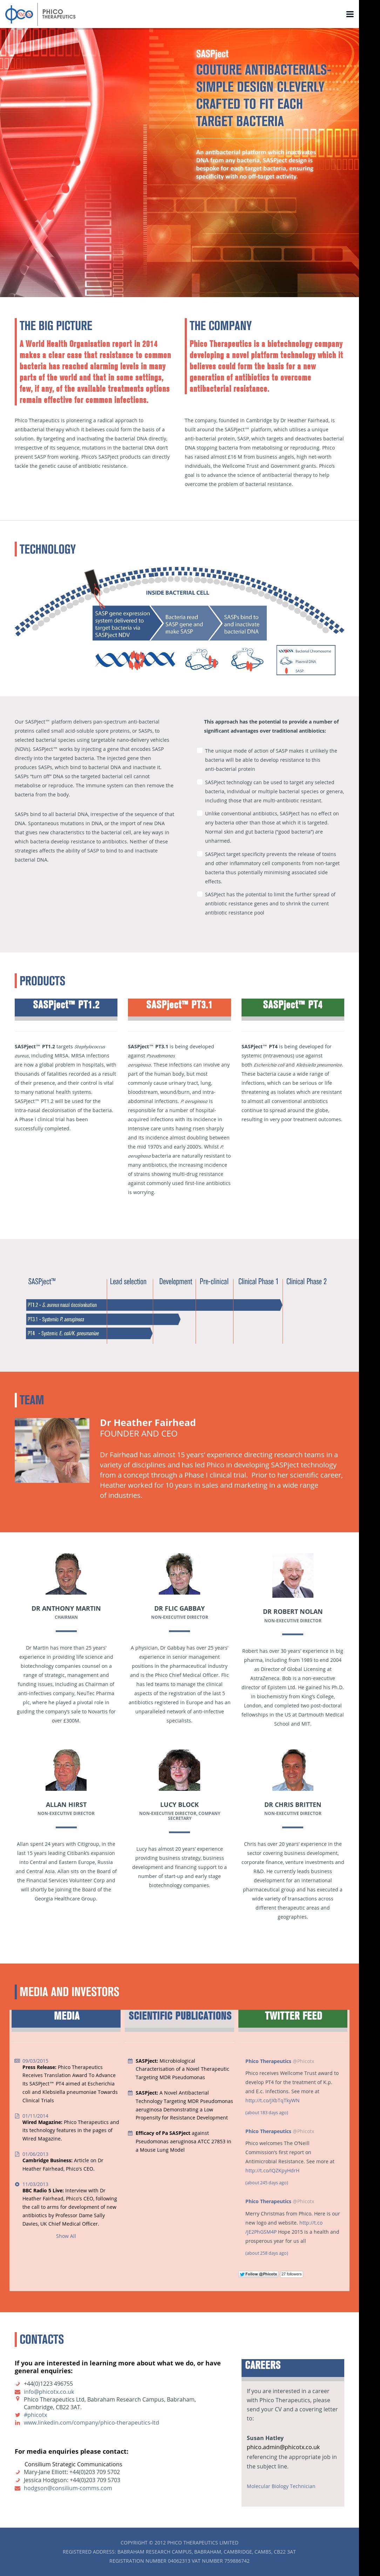 Phico Therapeutics Competitors, Revenue and Employees - Owler ...